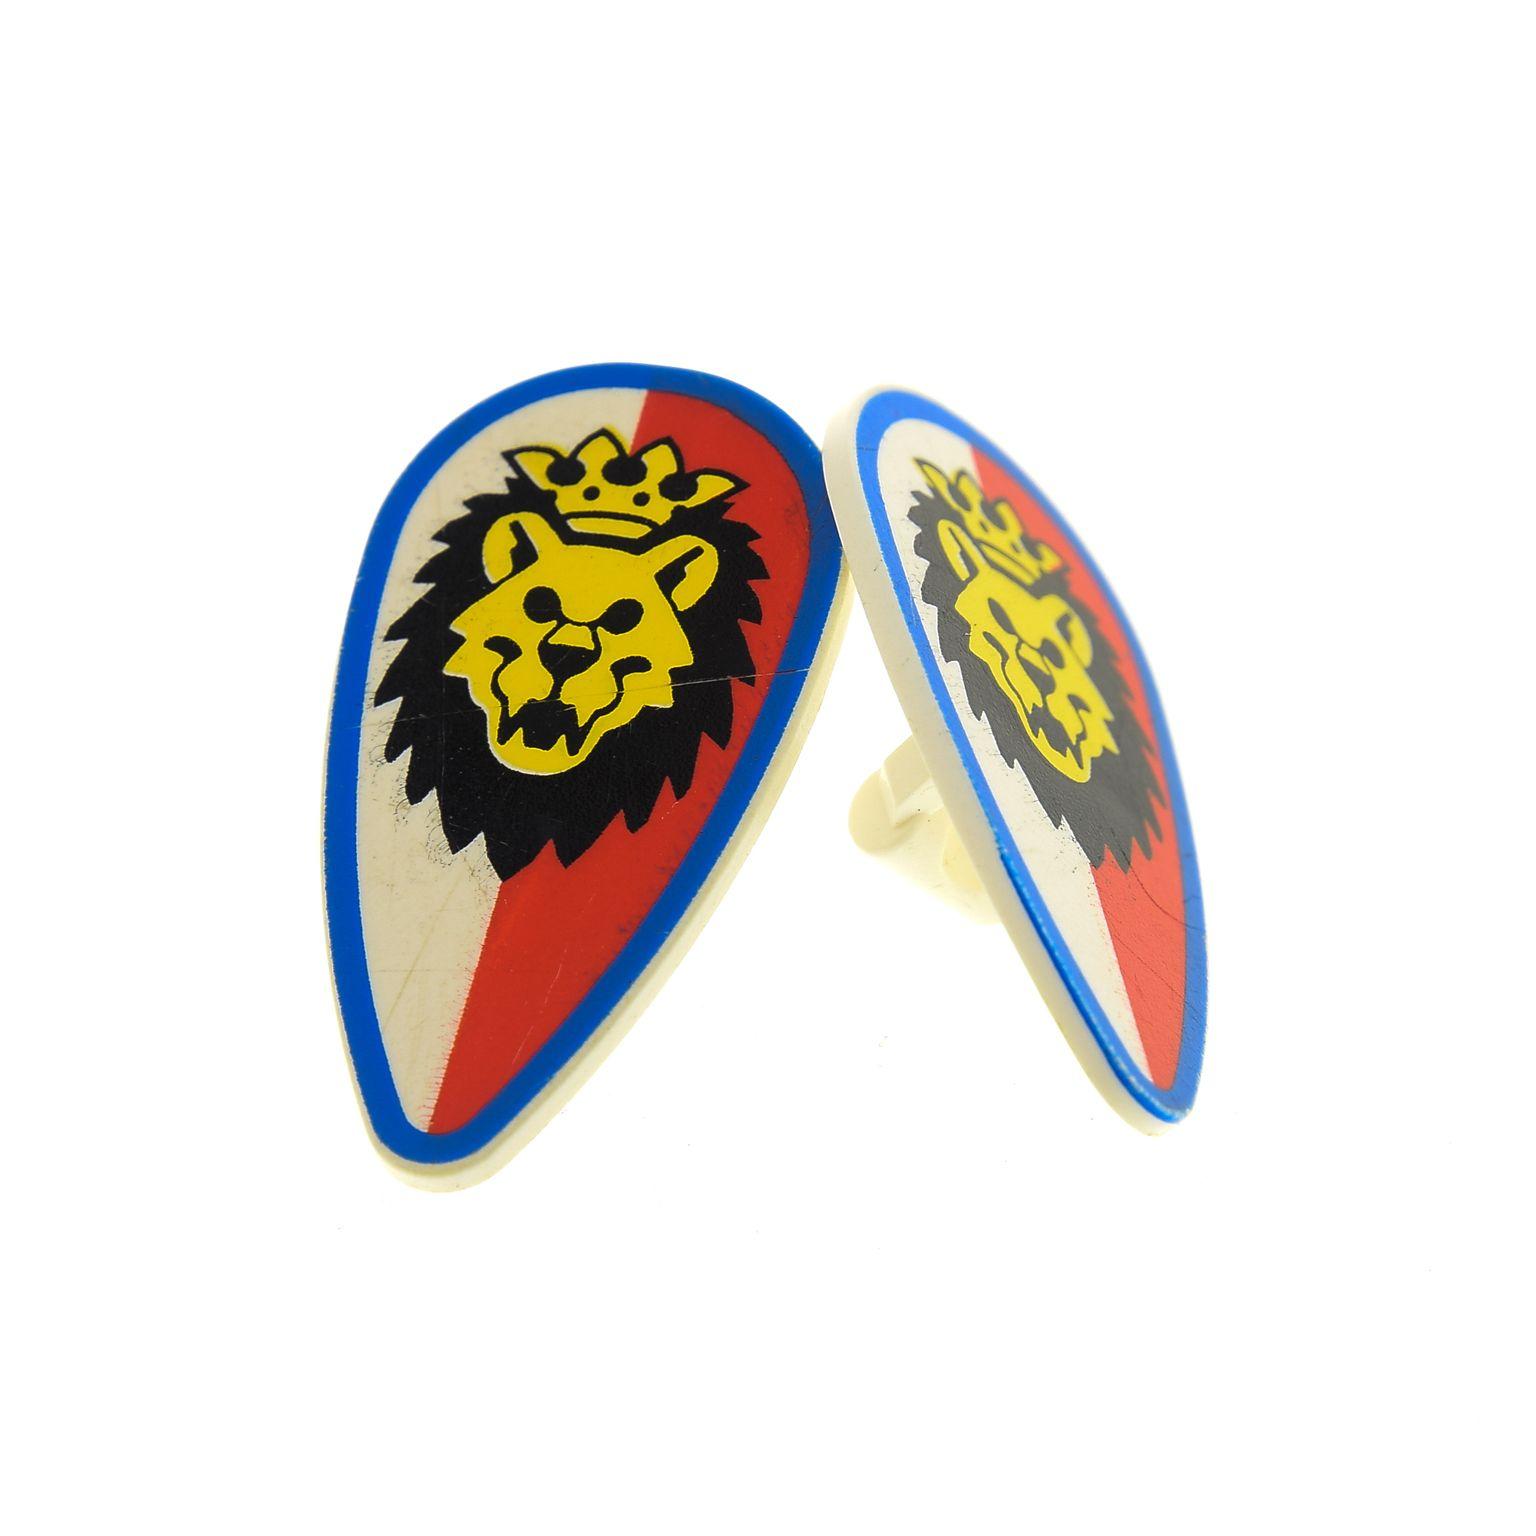 1x Lego Figuren Schild weiß oval Wappen Löwen Kopf Krone rot blau 9376 2586p4d